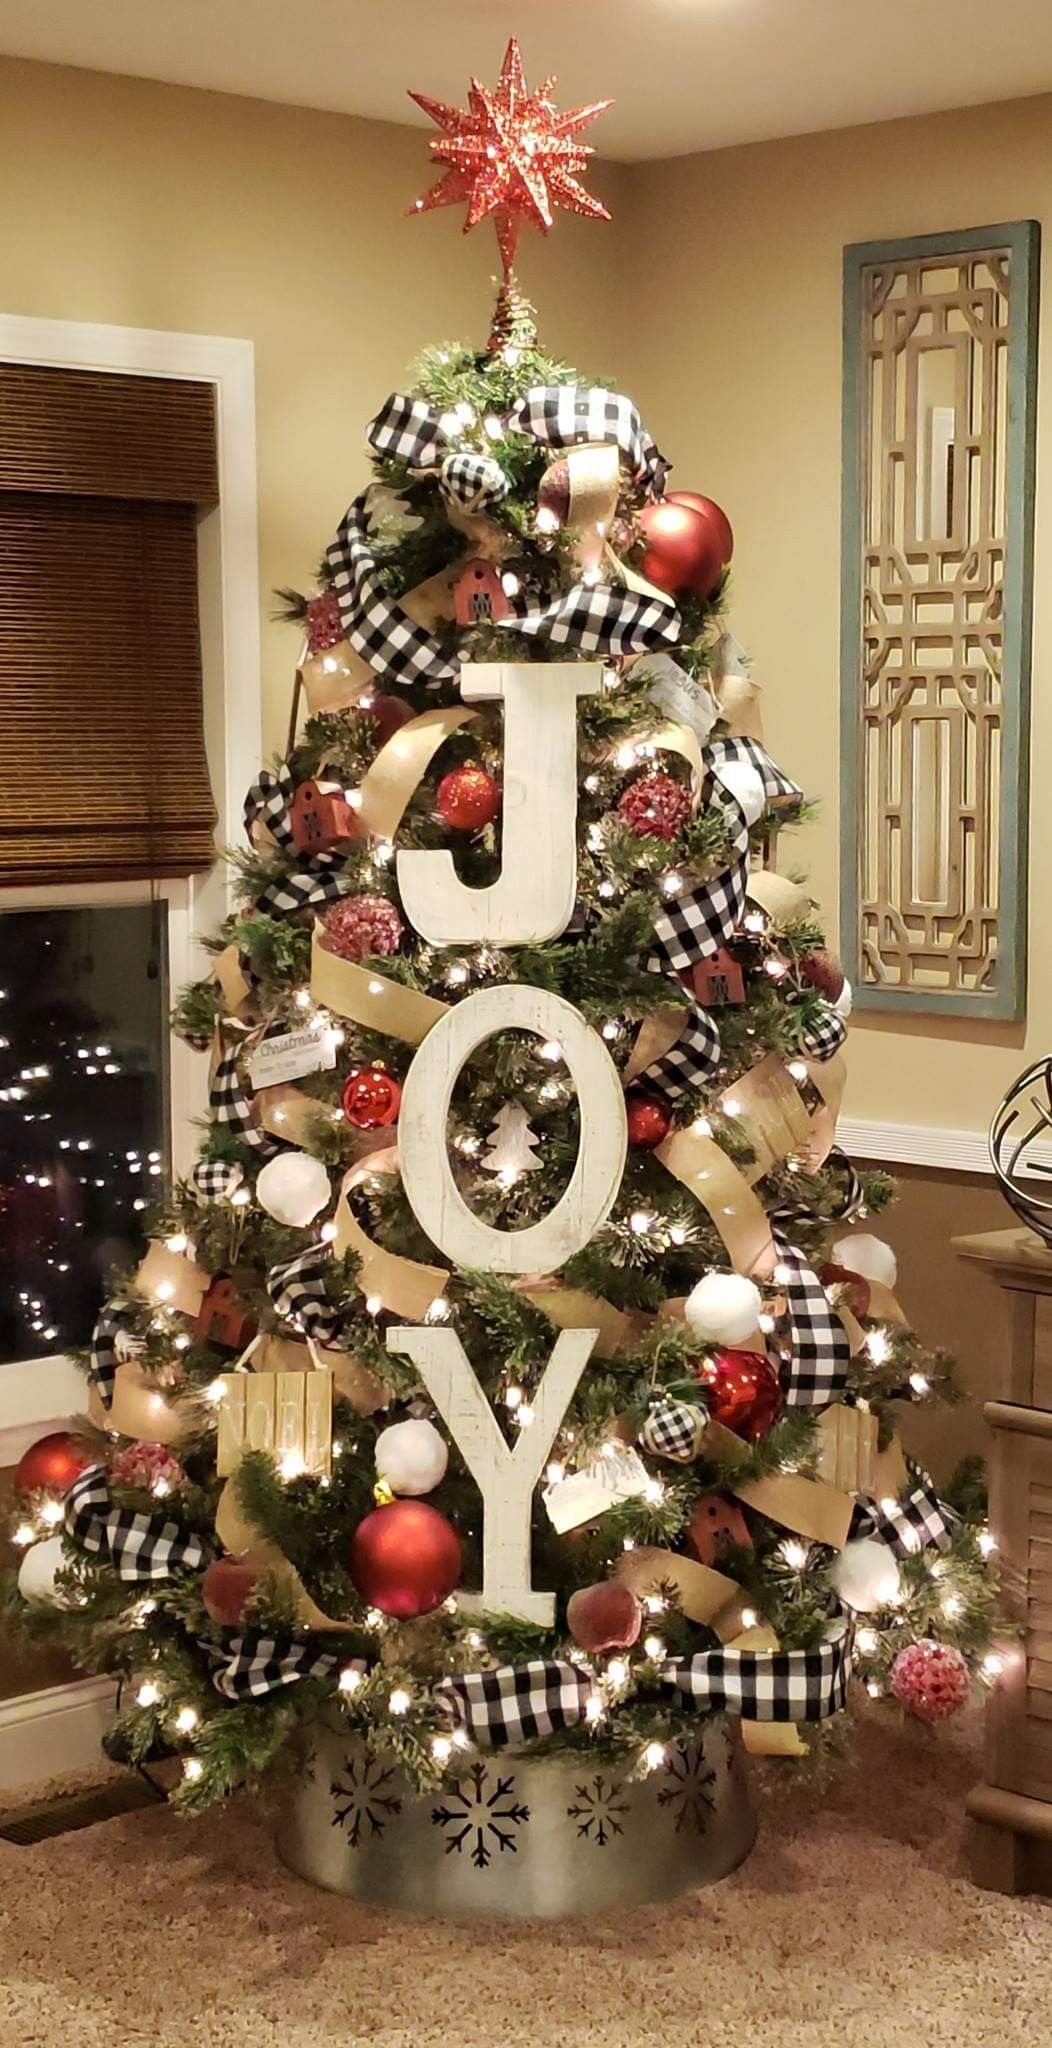 Albolito De Navidad Christmas Tree Decorations Diy Christmas Tree Inspiration Christmas Tree Crafts